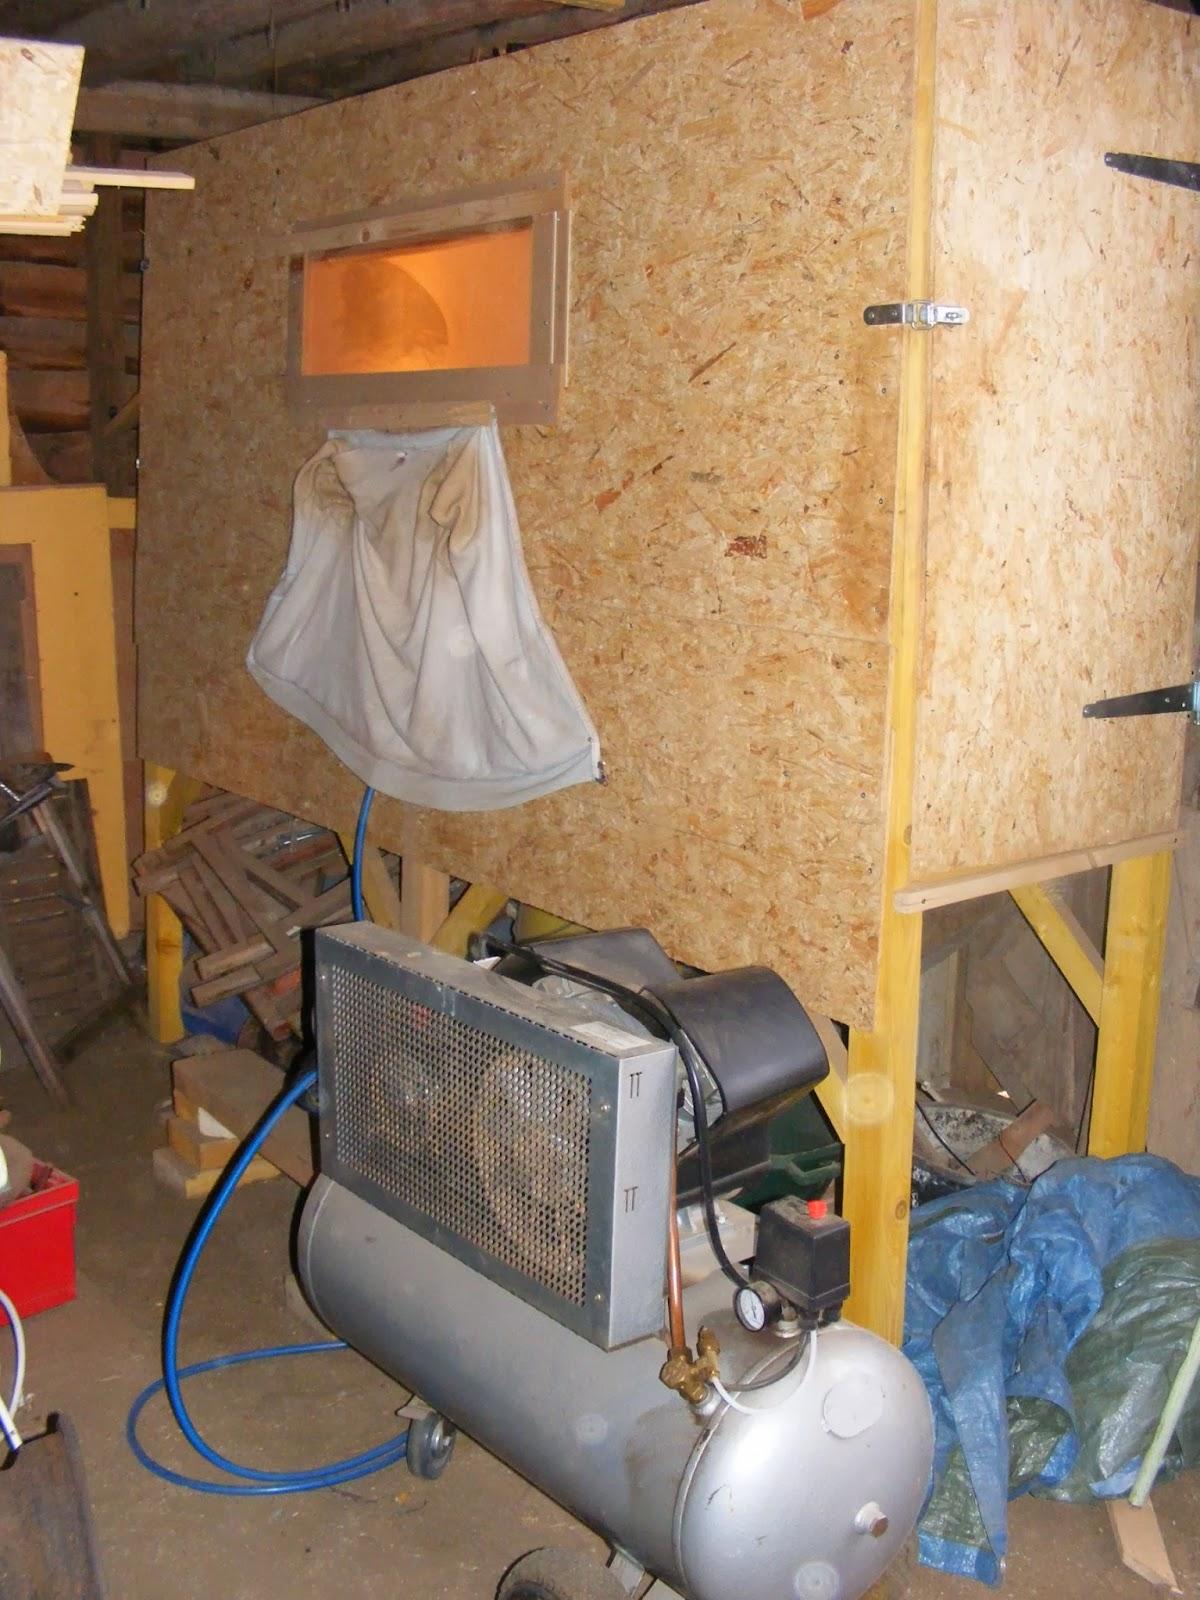 la roulotte de biche boni le sablage. Black Bedroom Furniture Sets. Home Design Ideas